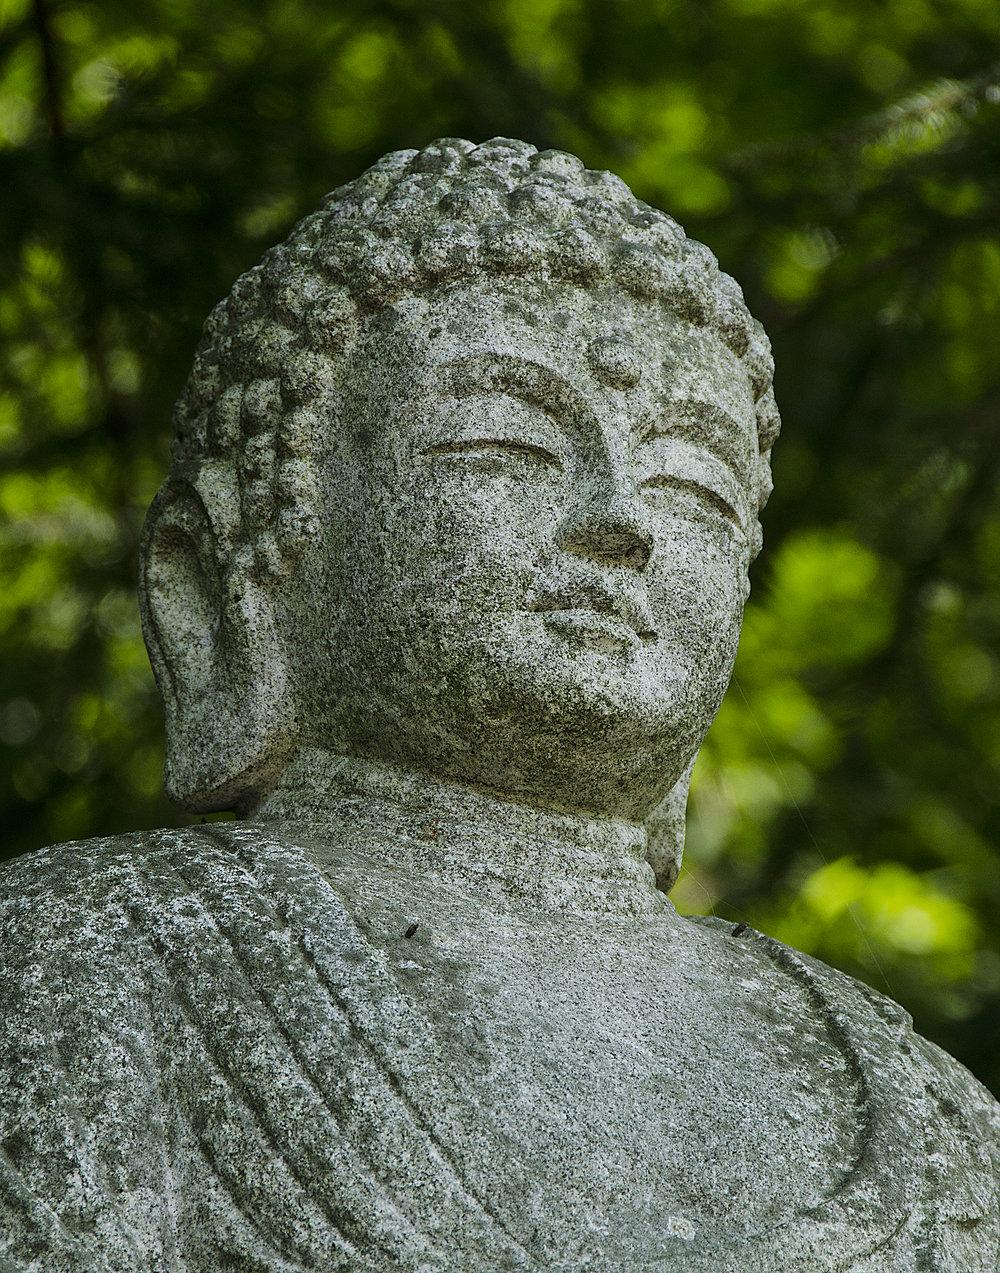 Spencer_Drake_Serenity_Photography_statue_buddha_buddhism_travel_korea.jpg